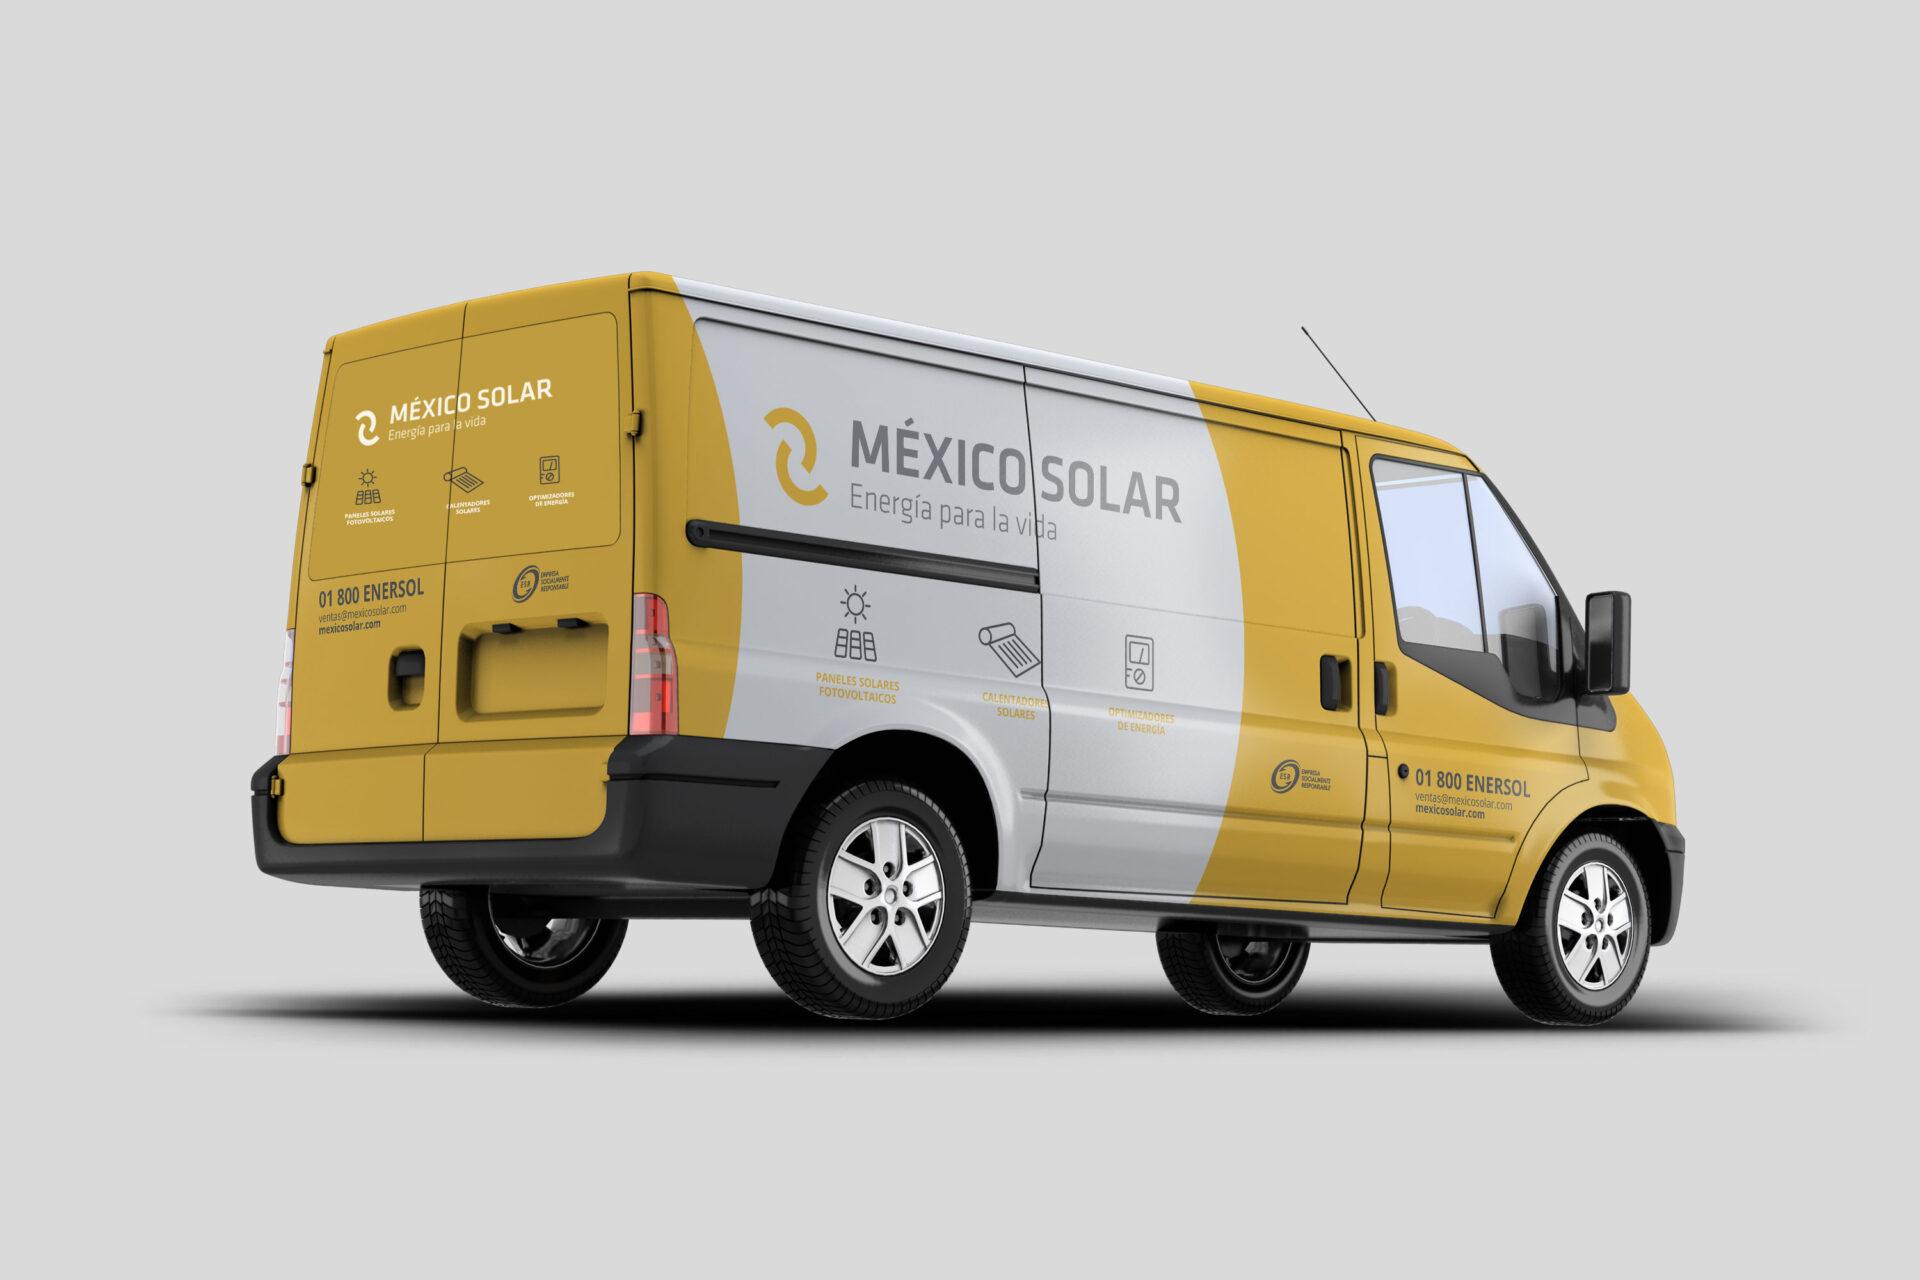 13-camioneta-mexico-solar